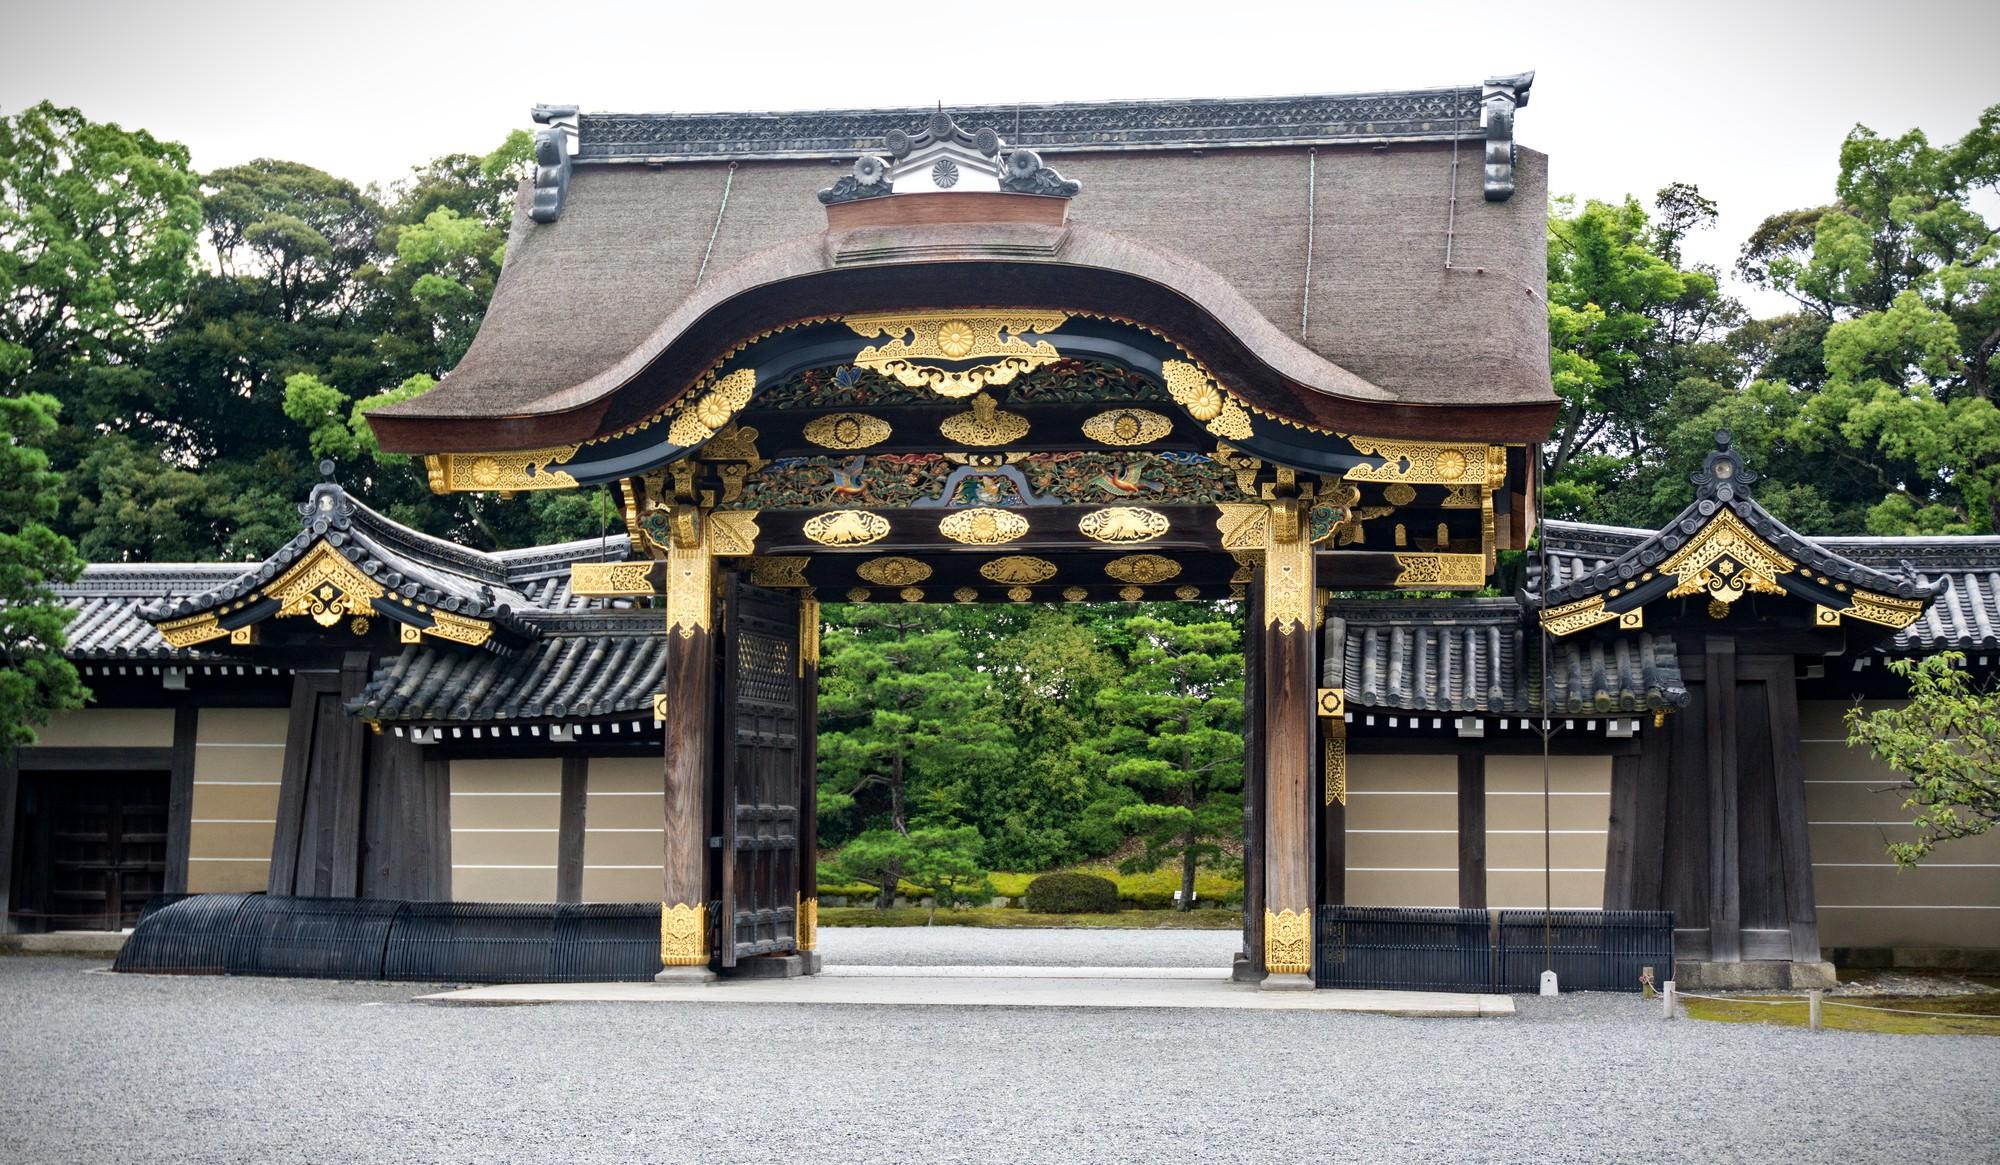 Karamon main gate at Nijo Castle, Kyoto. Credit: LizardJedi. Licensed under CC. Original modified.